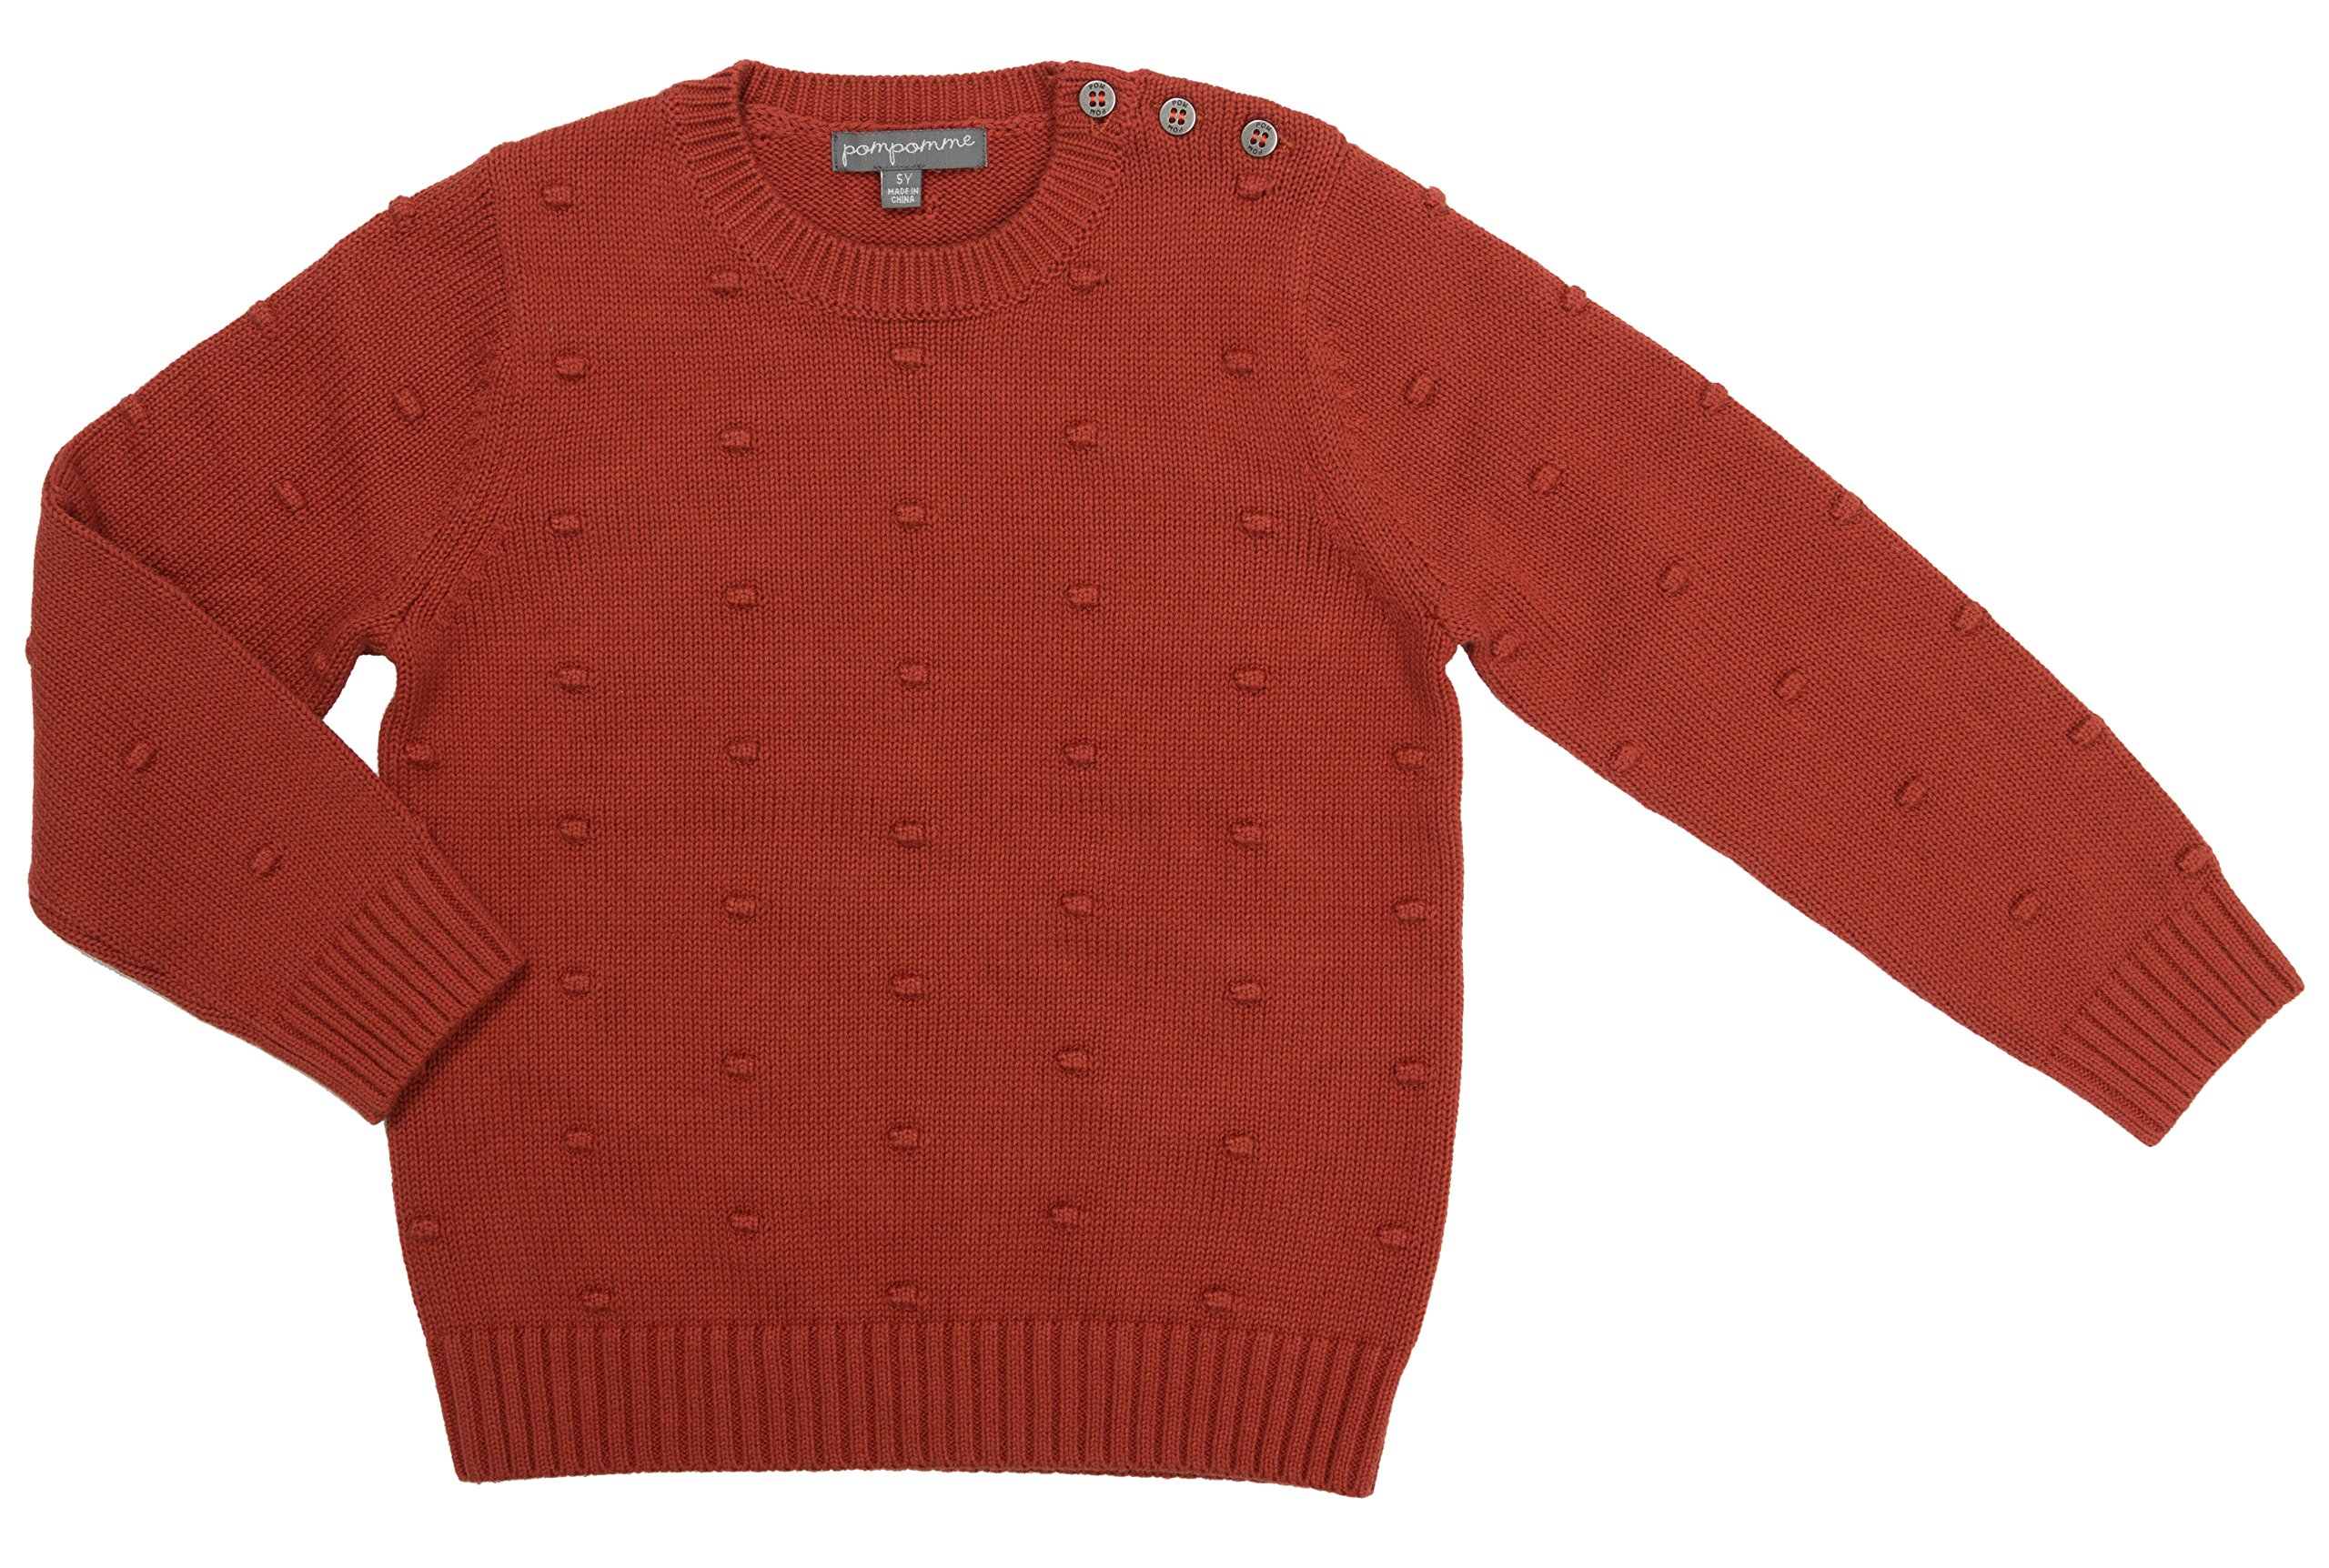 Pompomme Boy's Burnt Orange textured sweater w/button closure shoulder (6 Yr)